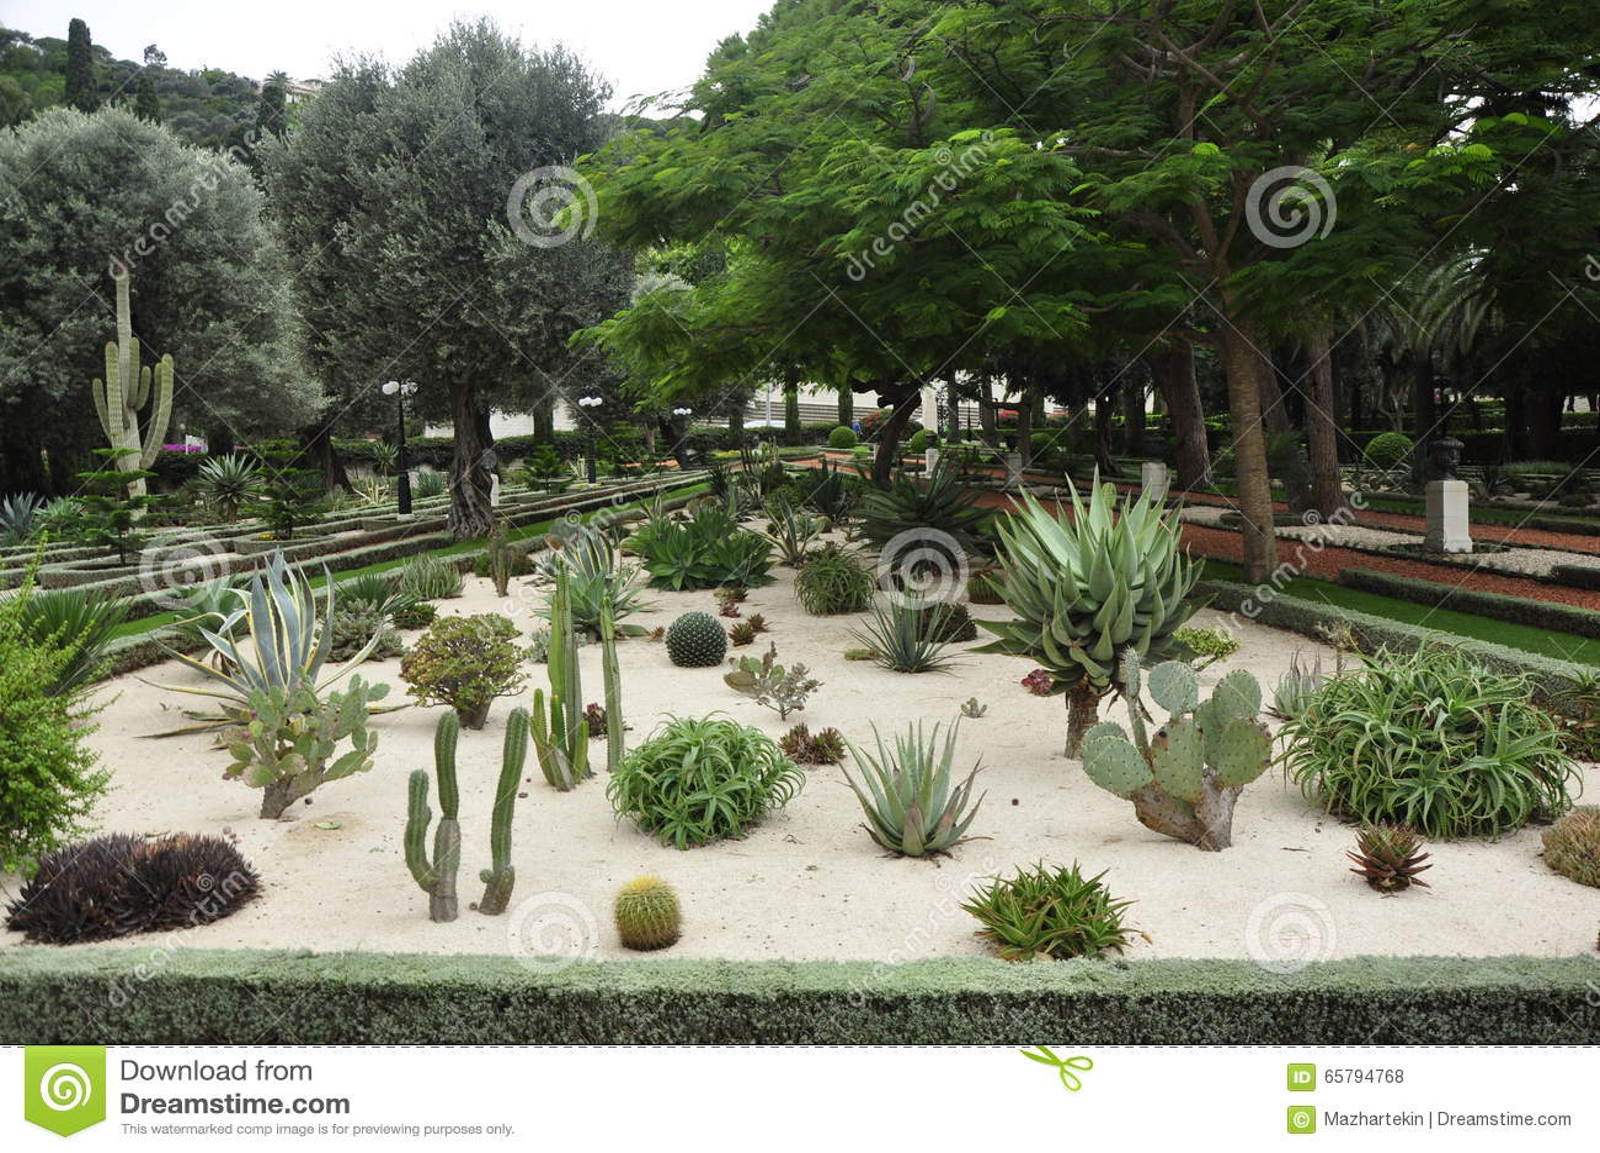 Jardin Cactus Stunning Cactus Gardens Jardin De Cactus With Jardin Cactus Cactus Fruit At The